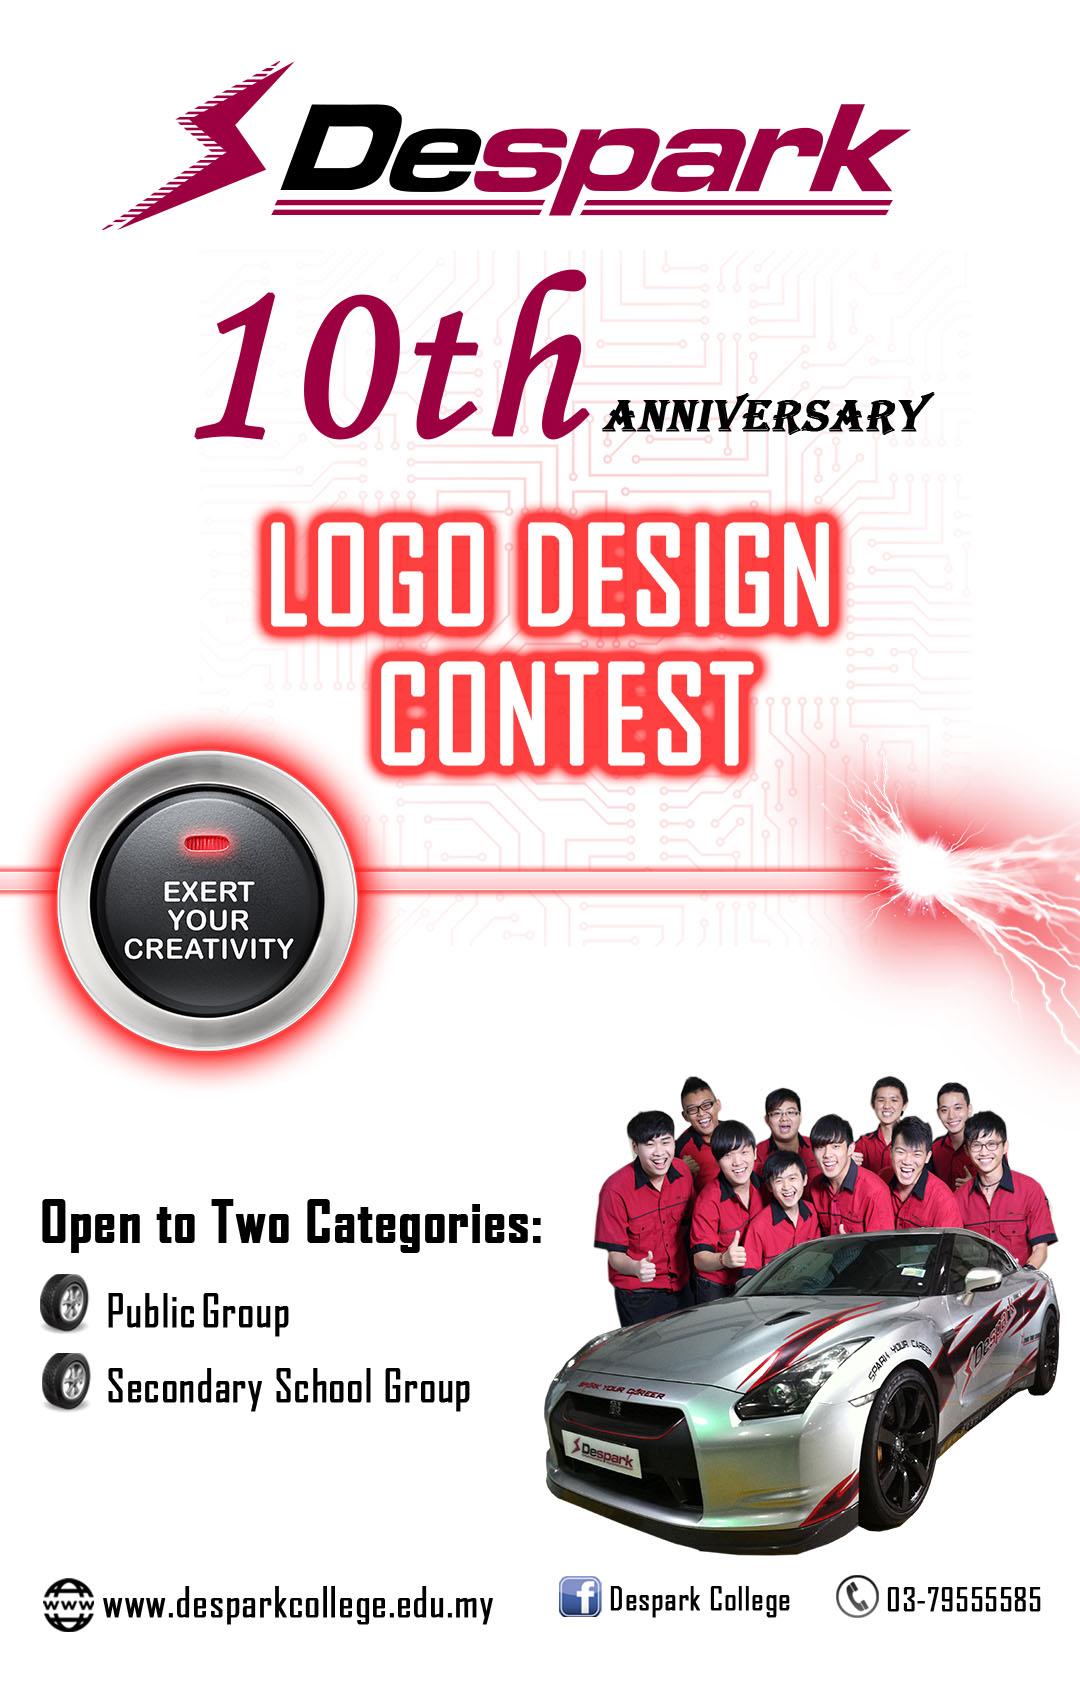 Logo Design Contest1